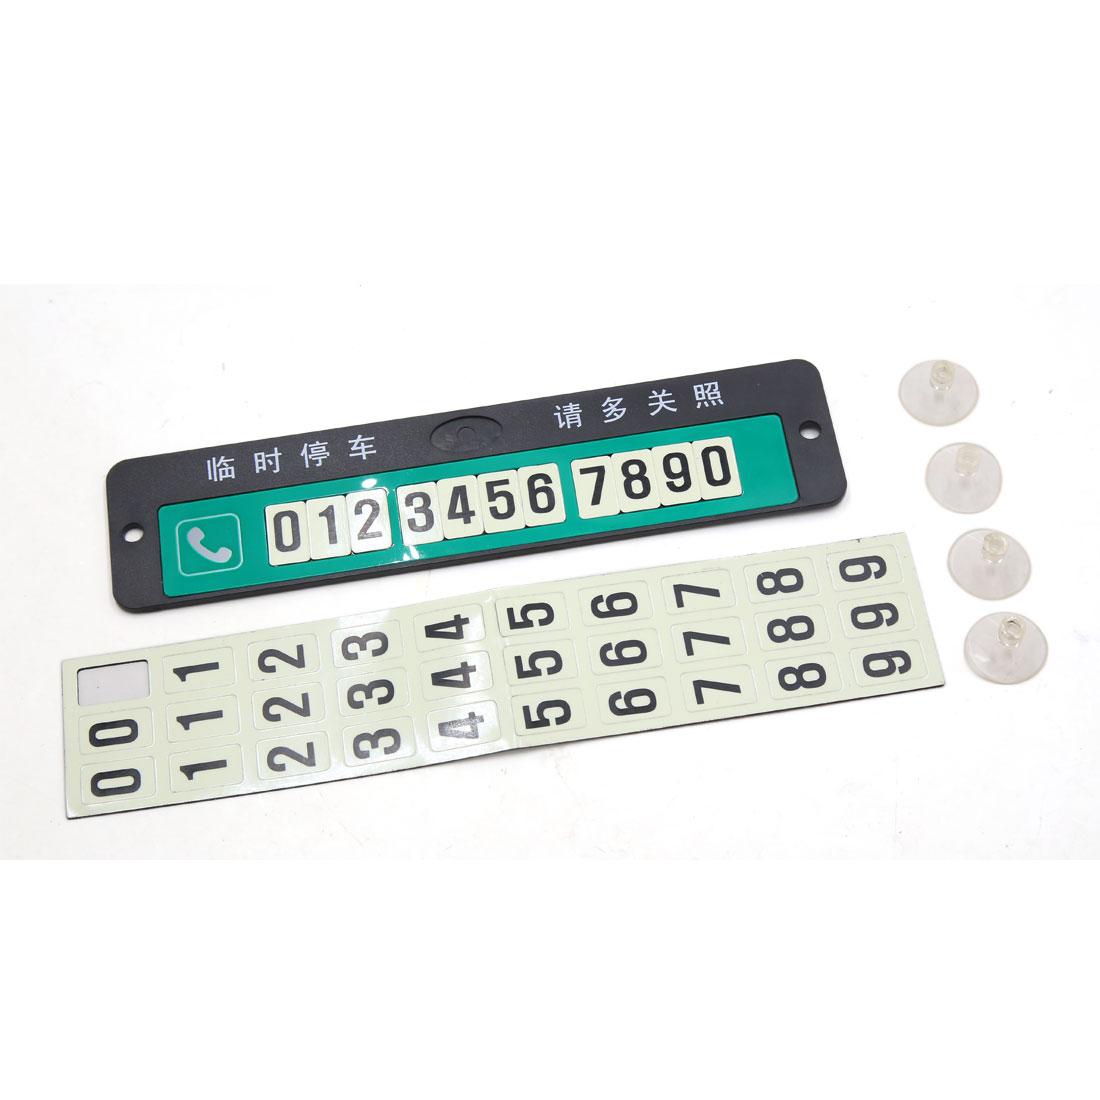 Green Car Auto Luminous Parking Notification Phone Number Card 20 x 4.8 x 0.3cm